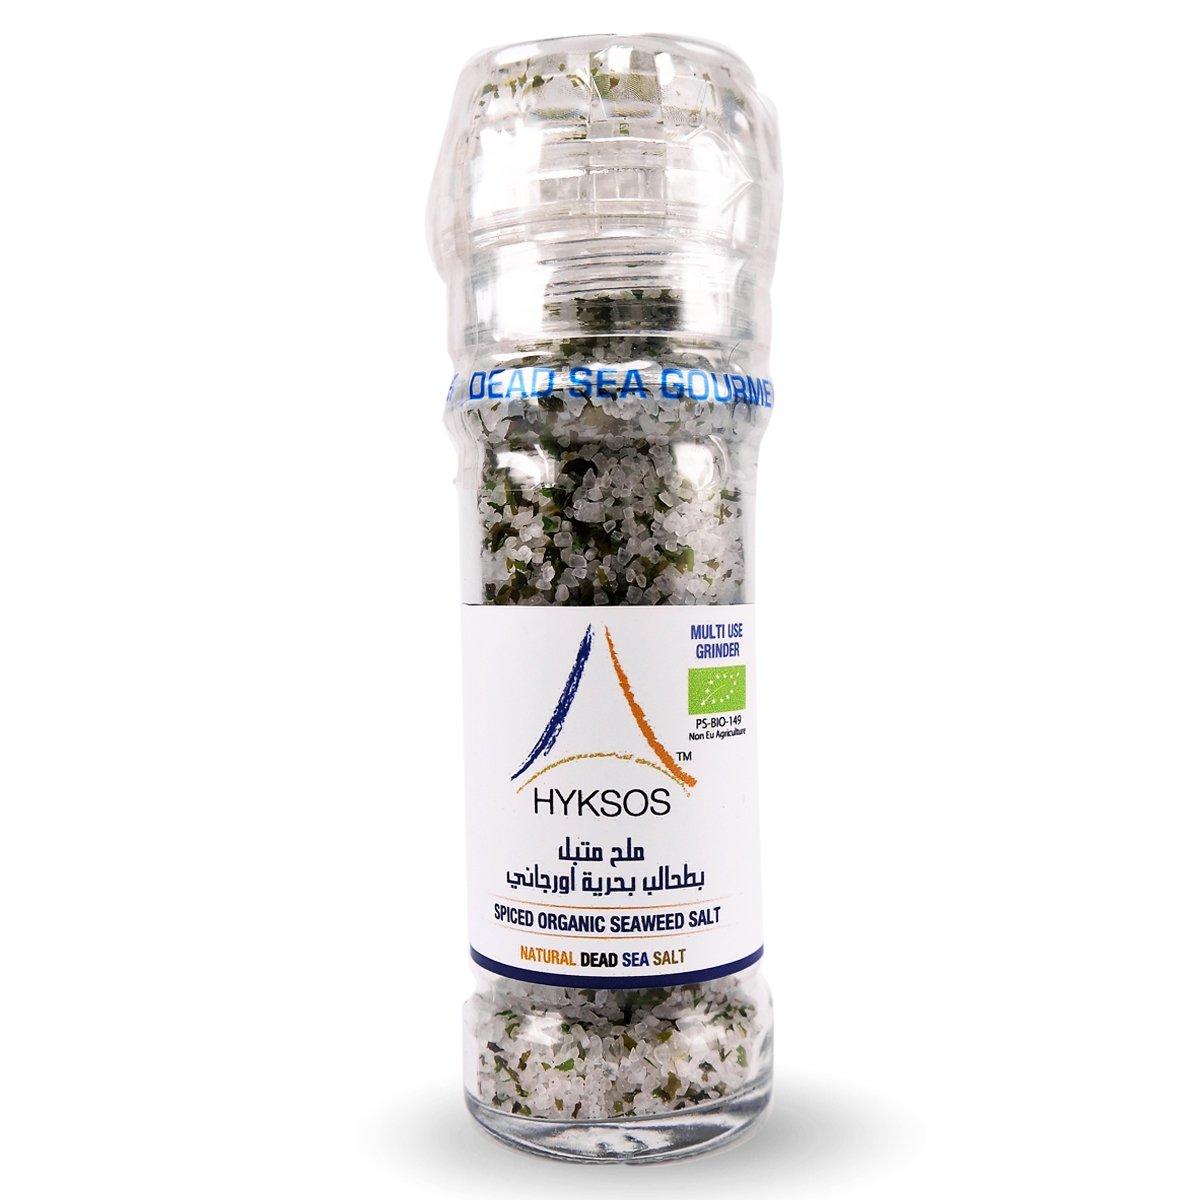 Hyksos Natural Spiced ORGANIC Seaweed Salt 3.9 oz - Multi Use Grinder